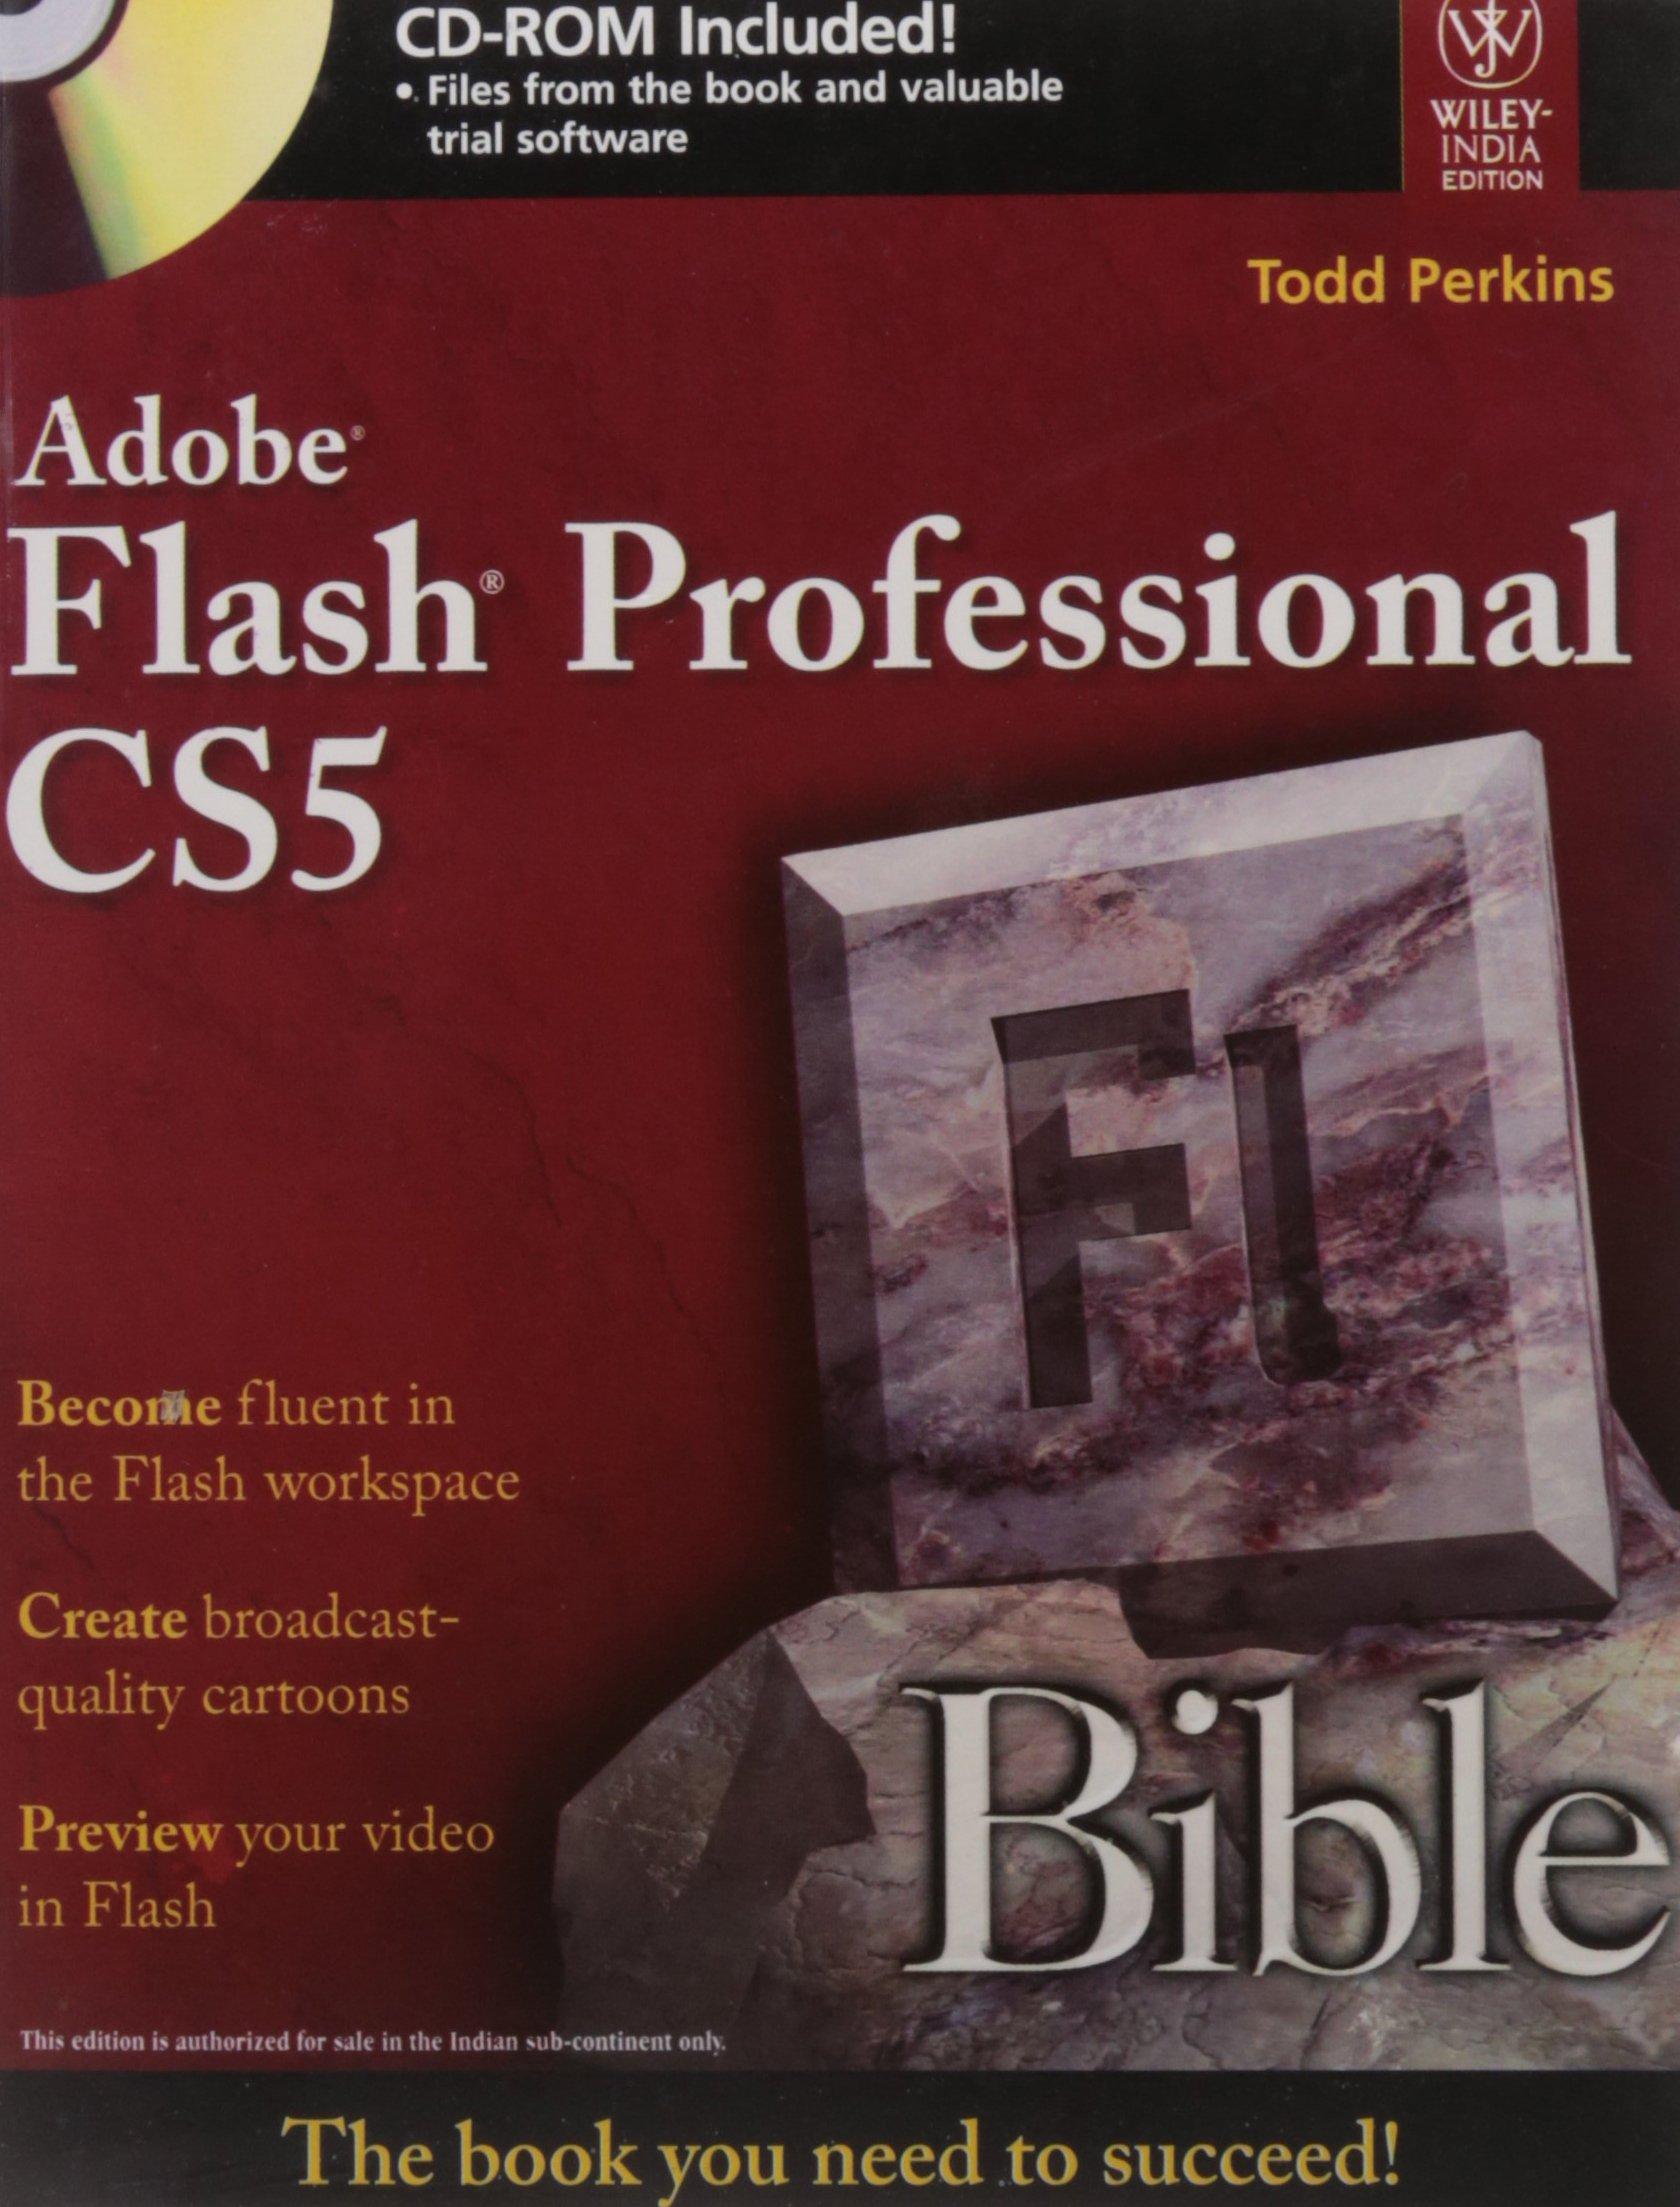 Where To Buy Adobe Flash Professional CS5